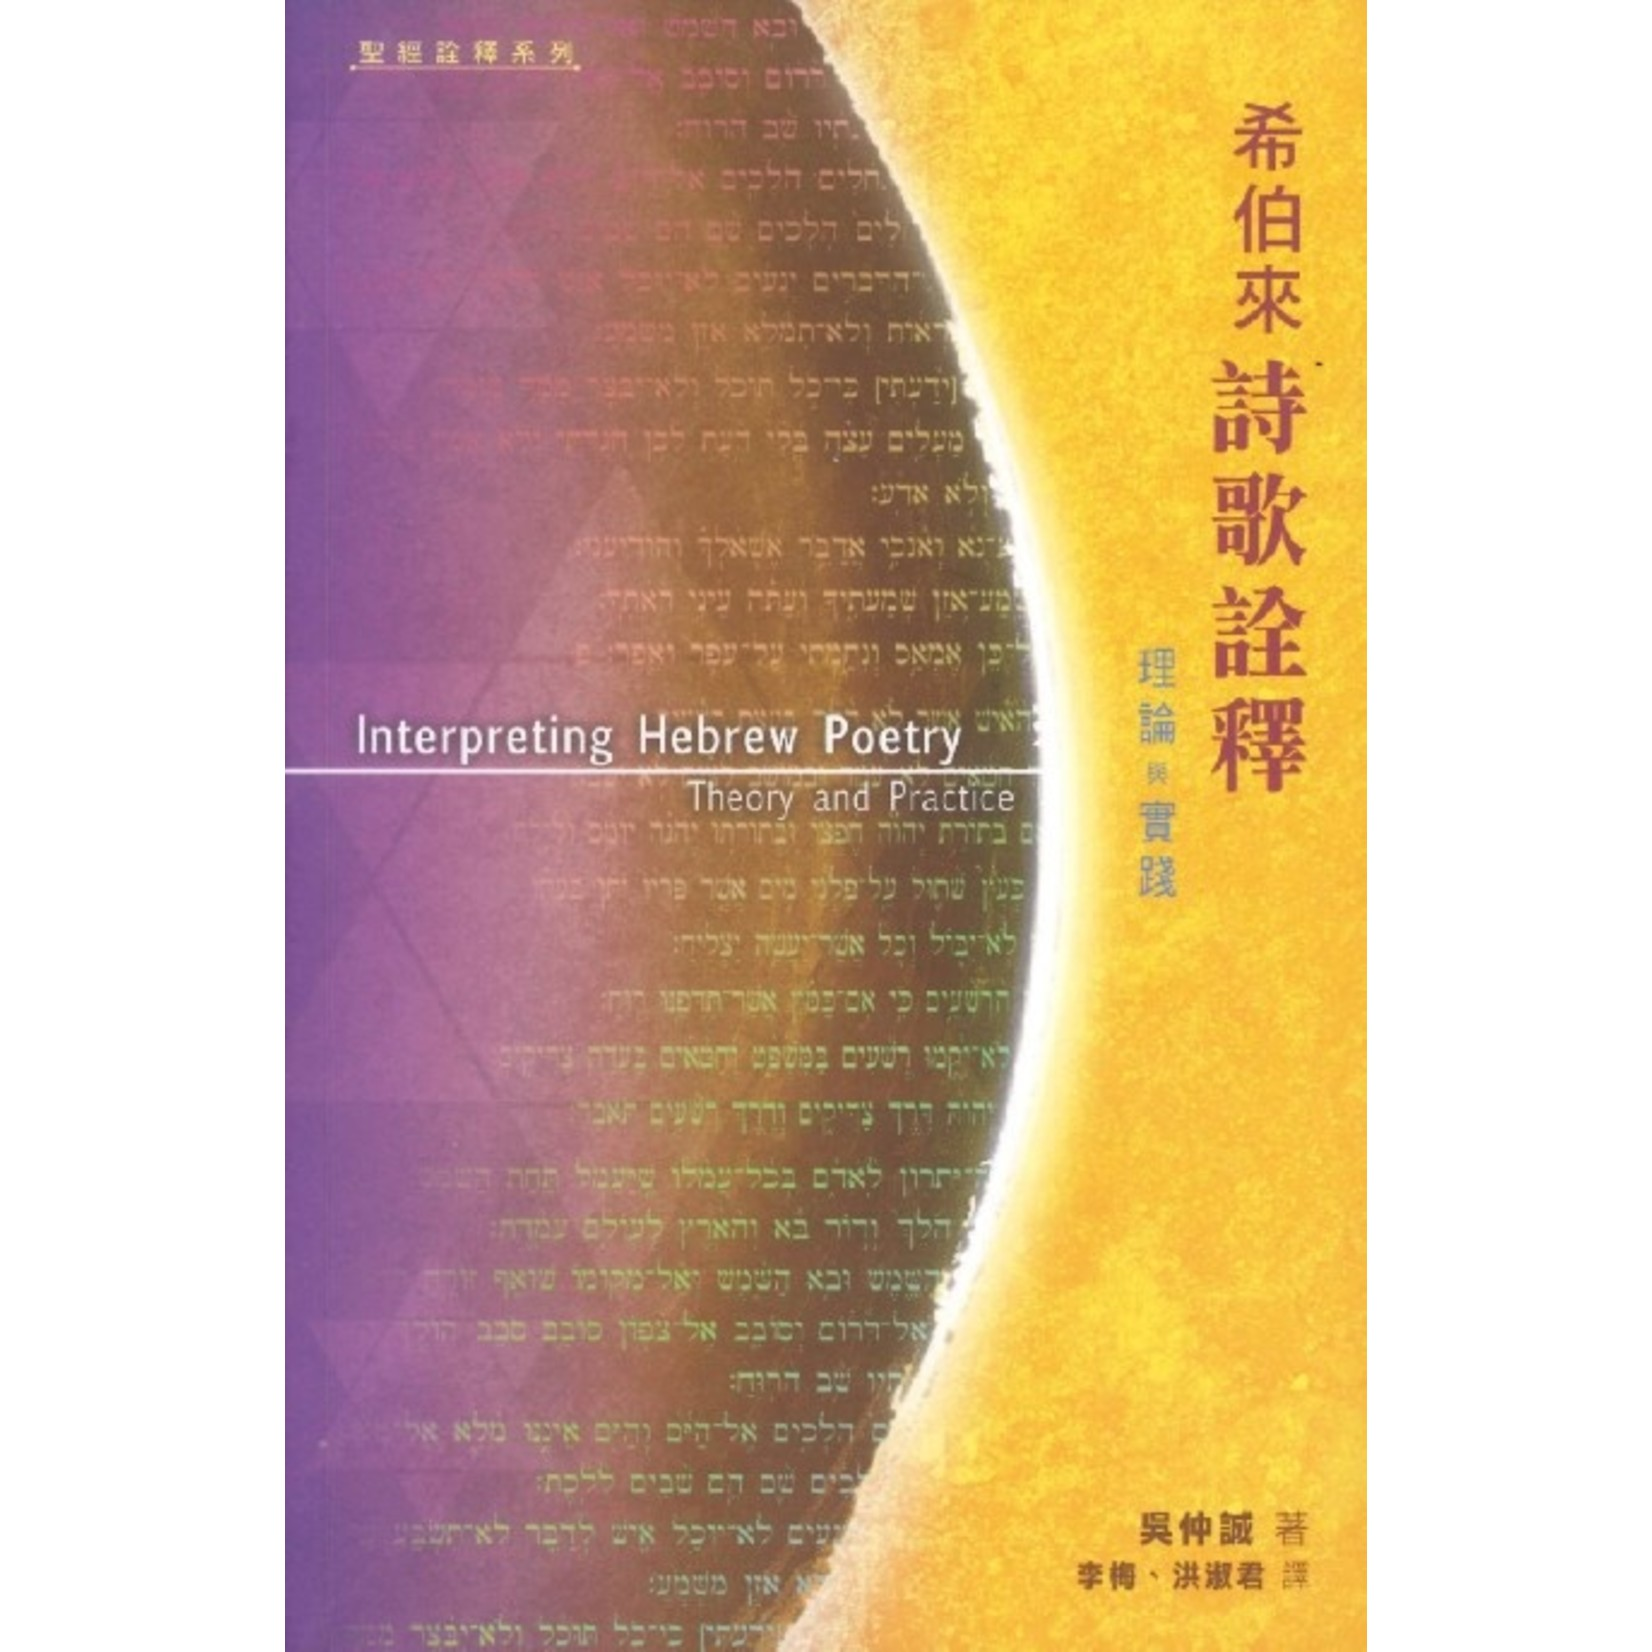 天道書樓 Tien Dao Publishing House 希伯來詩歌詮釋:理論與實踐 Interpreting Hebrew Poetry: Theory and Practice